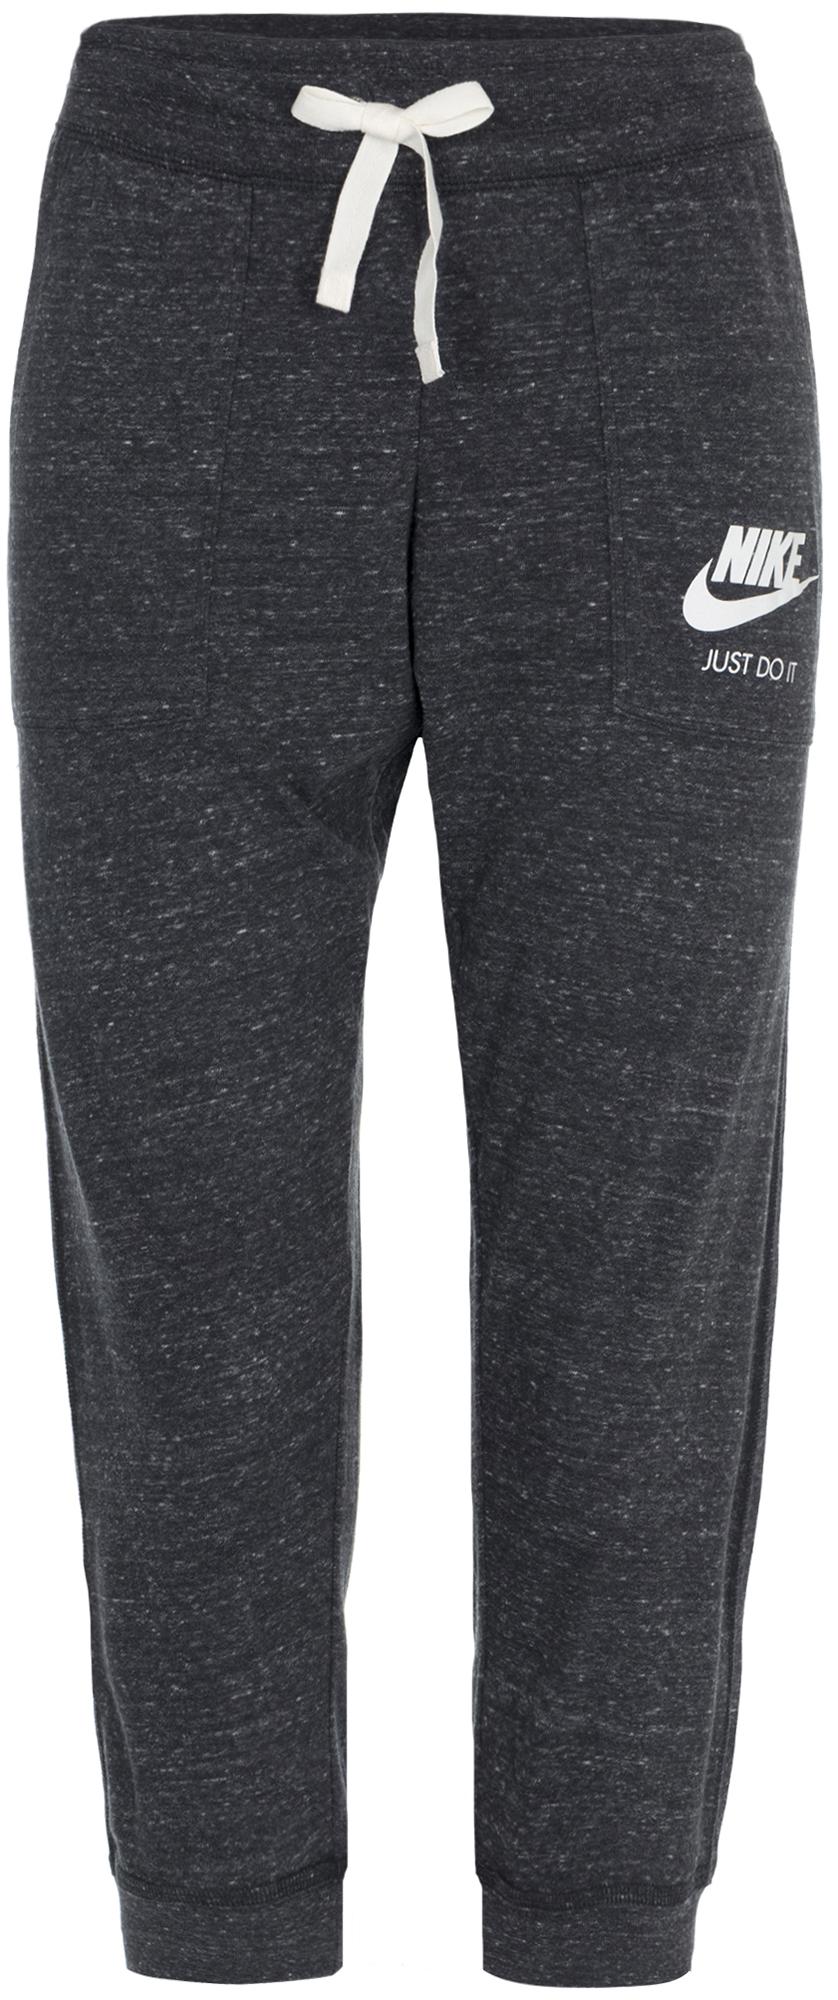 Nike Бриджи женские Nike Sportswear Vintage nike sportswear nike sportswear air force 1 low retro